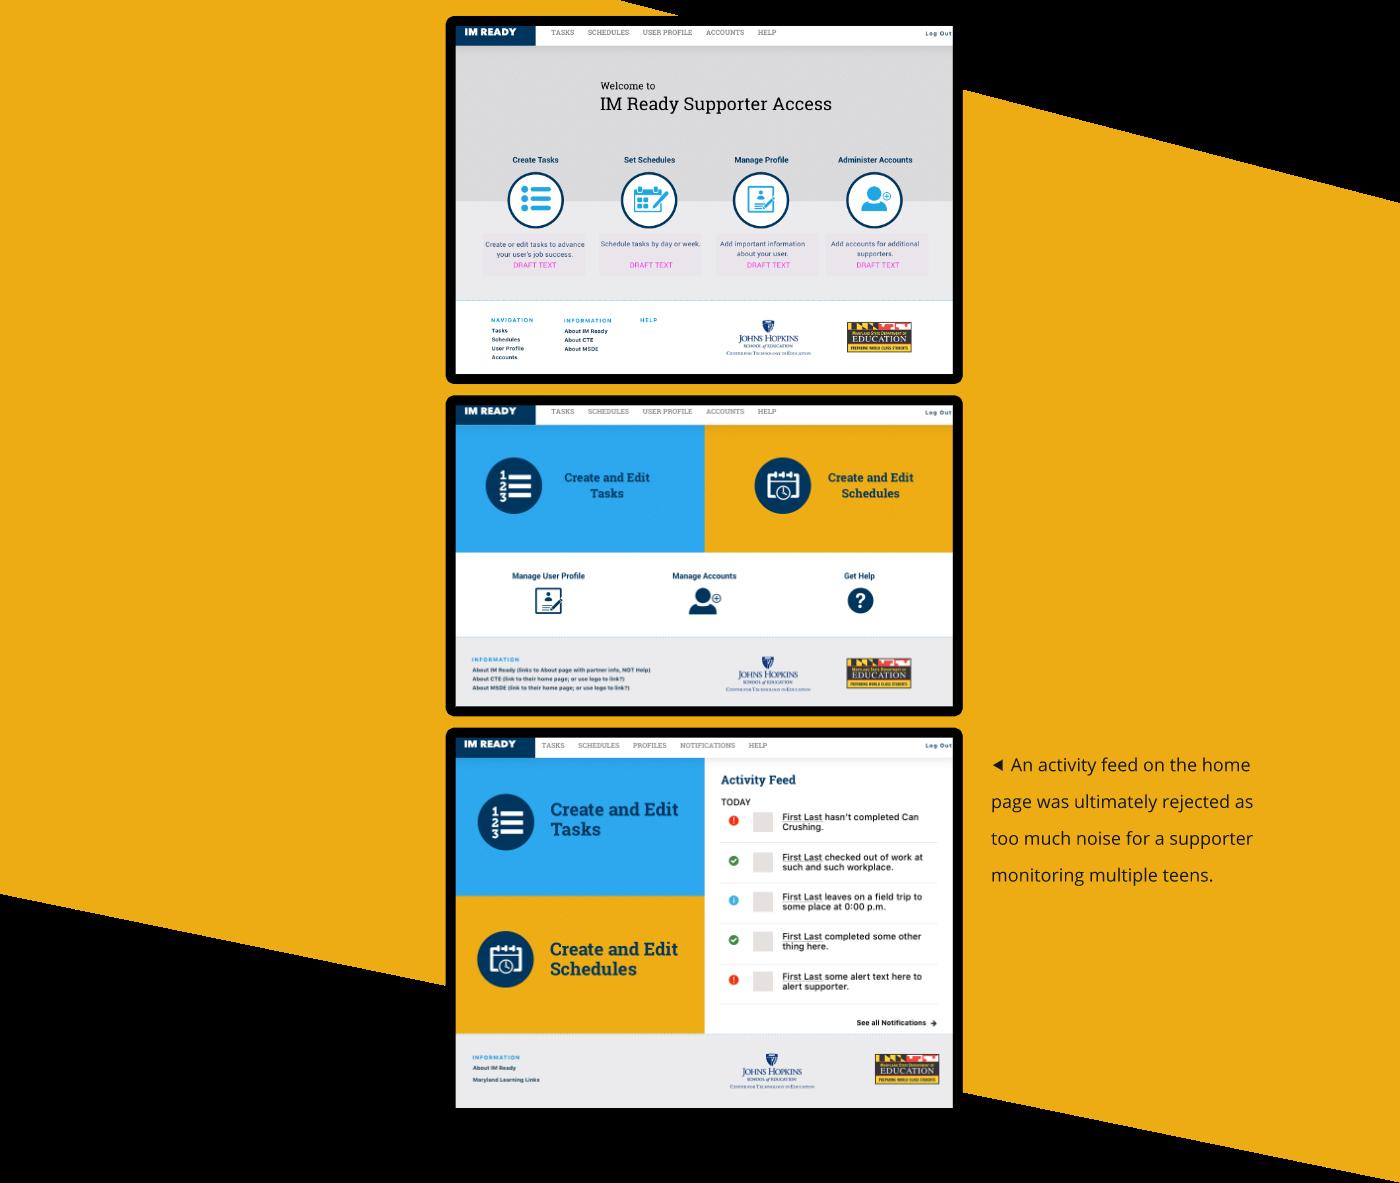 ui design,Web Design ,visual design,web app,information architecture